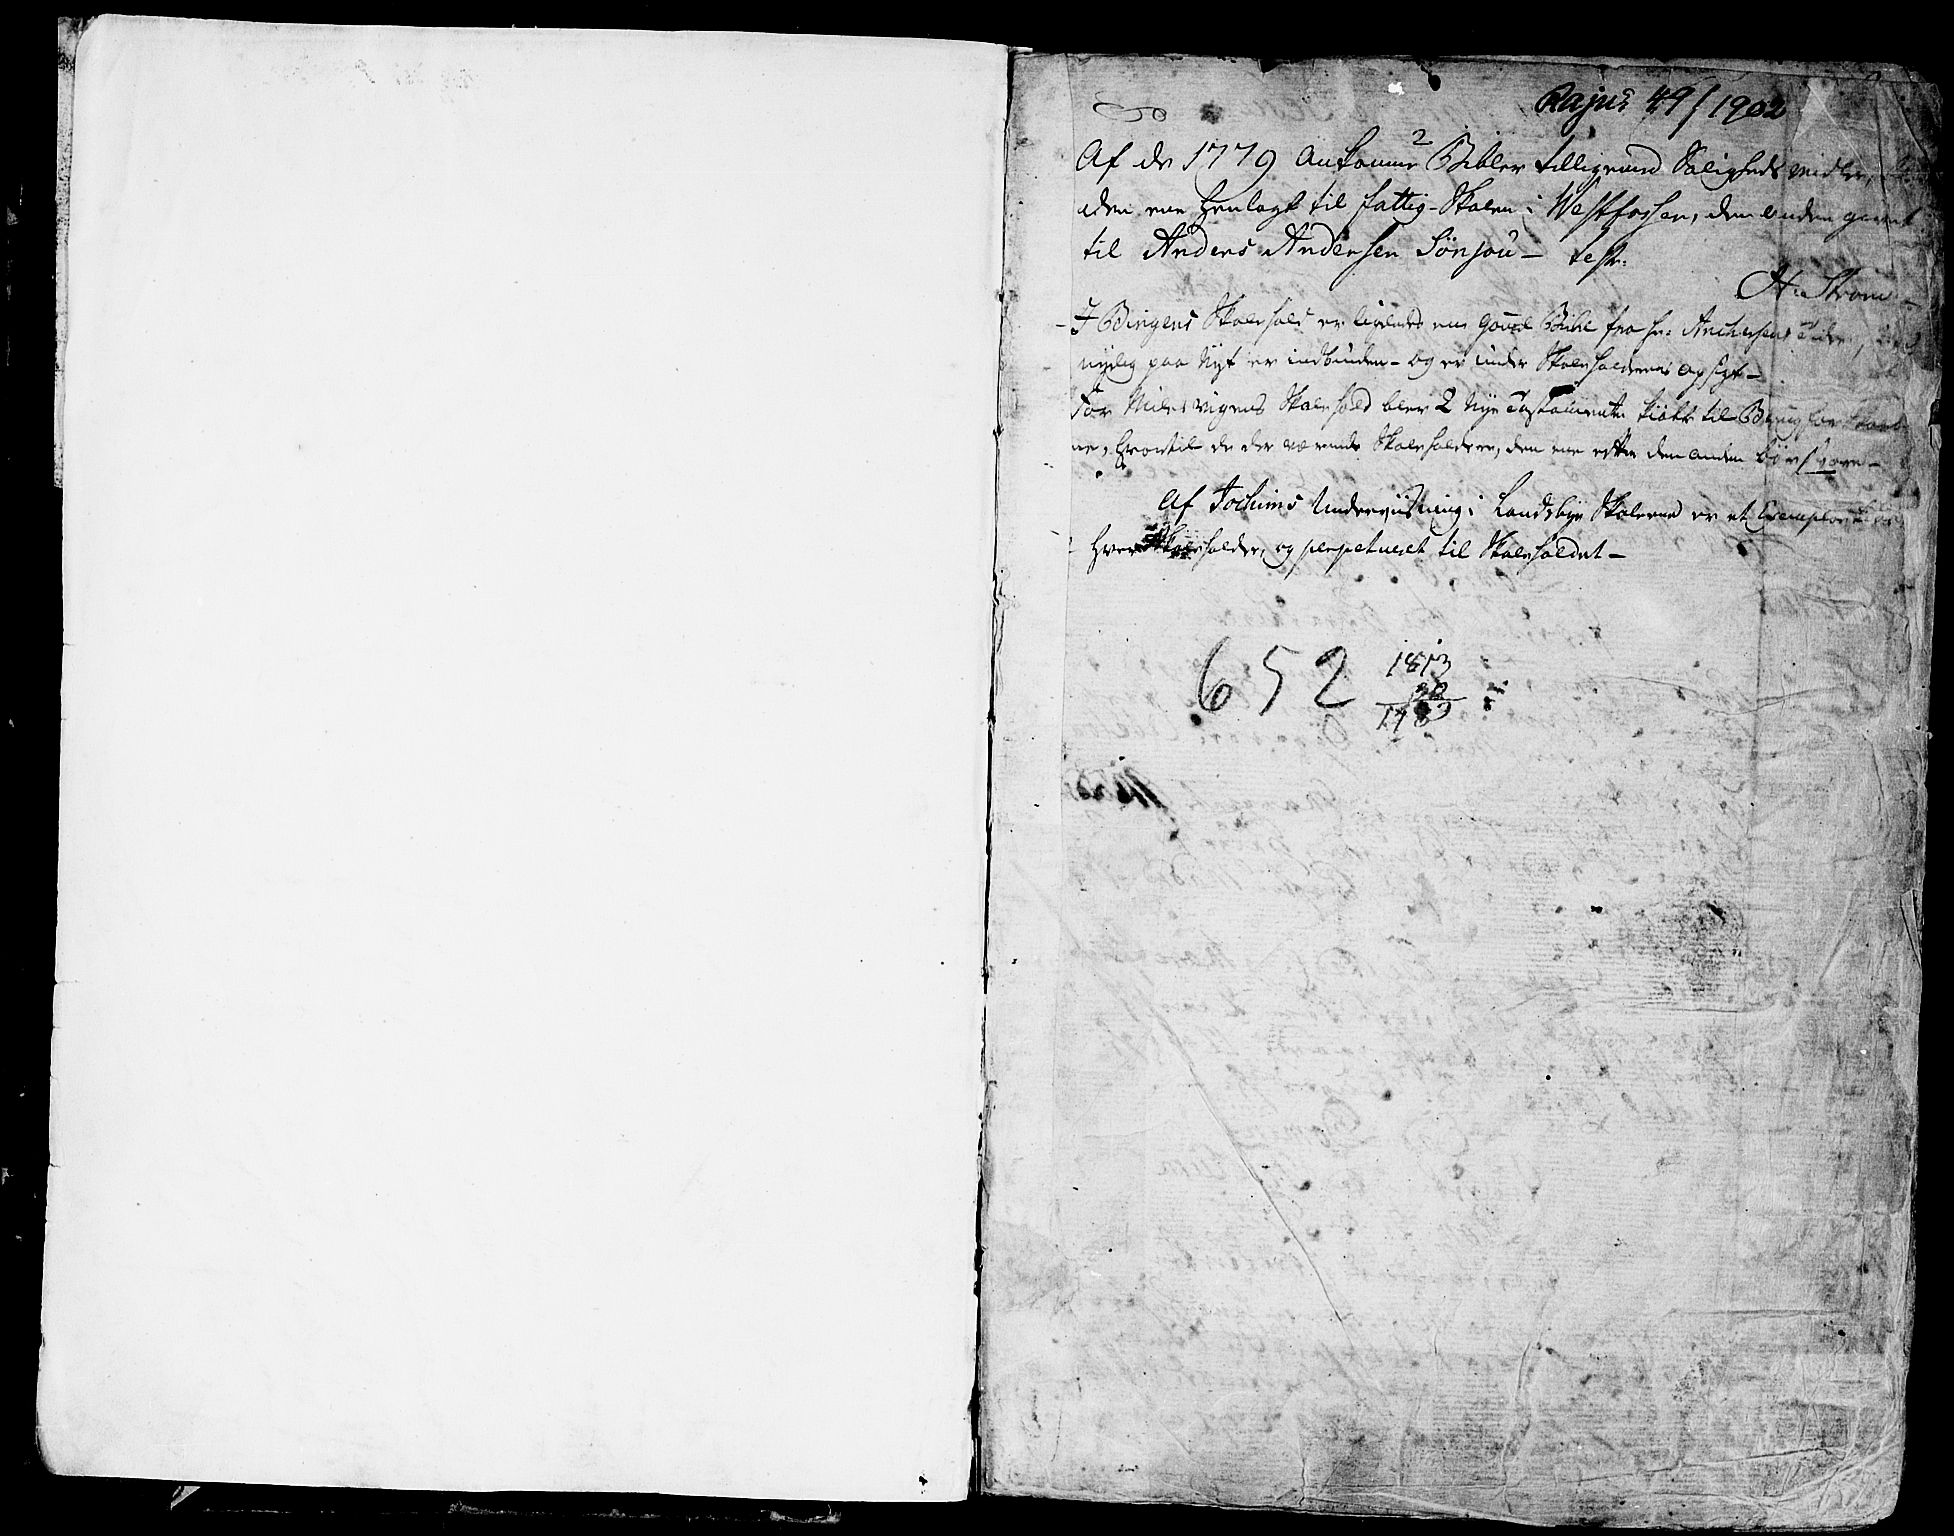 SAKO, Eiker kirkebøker, F/Fa/L0008: Ministerialbok nr. I 8, 1764-1788, s. 1